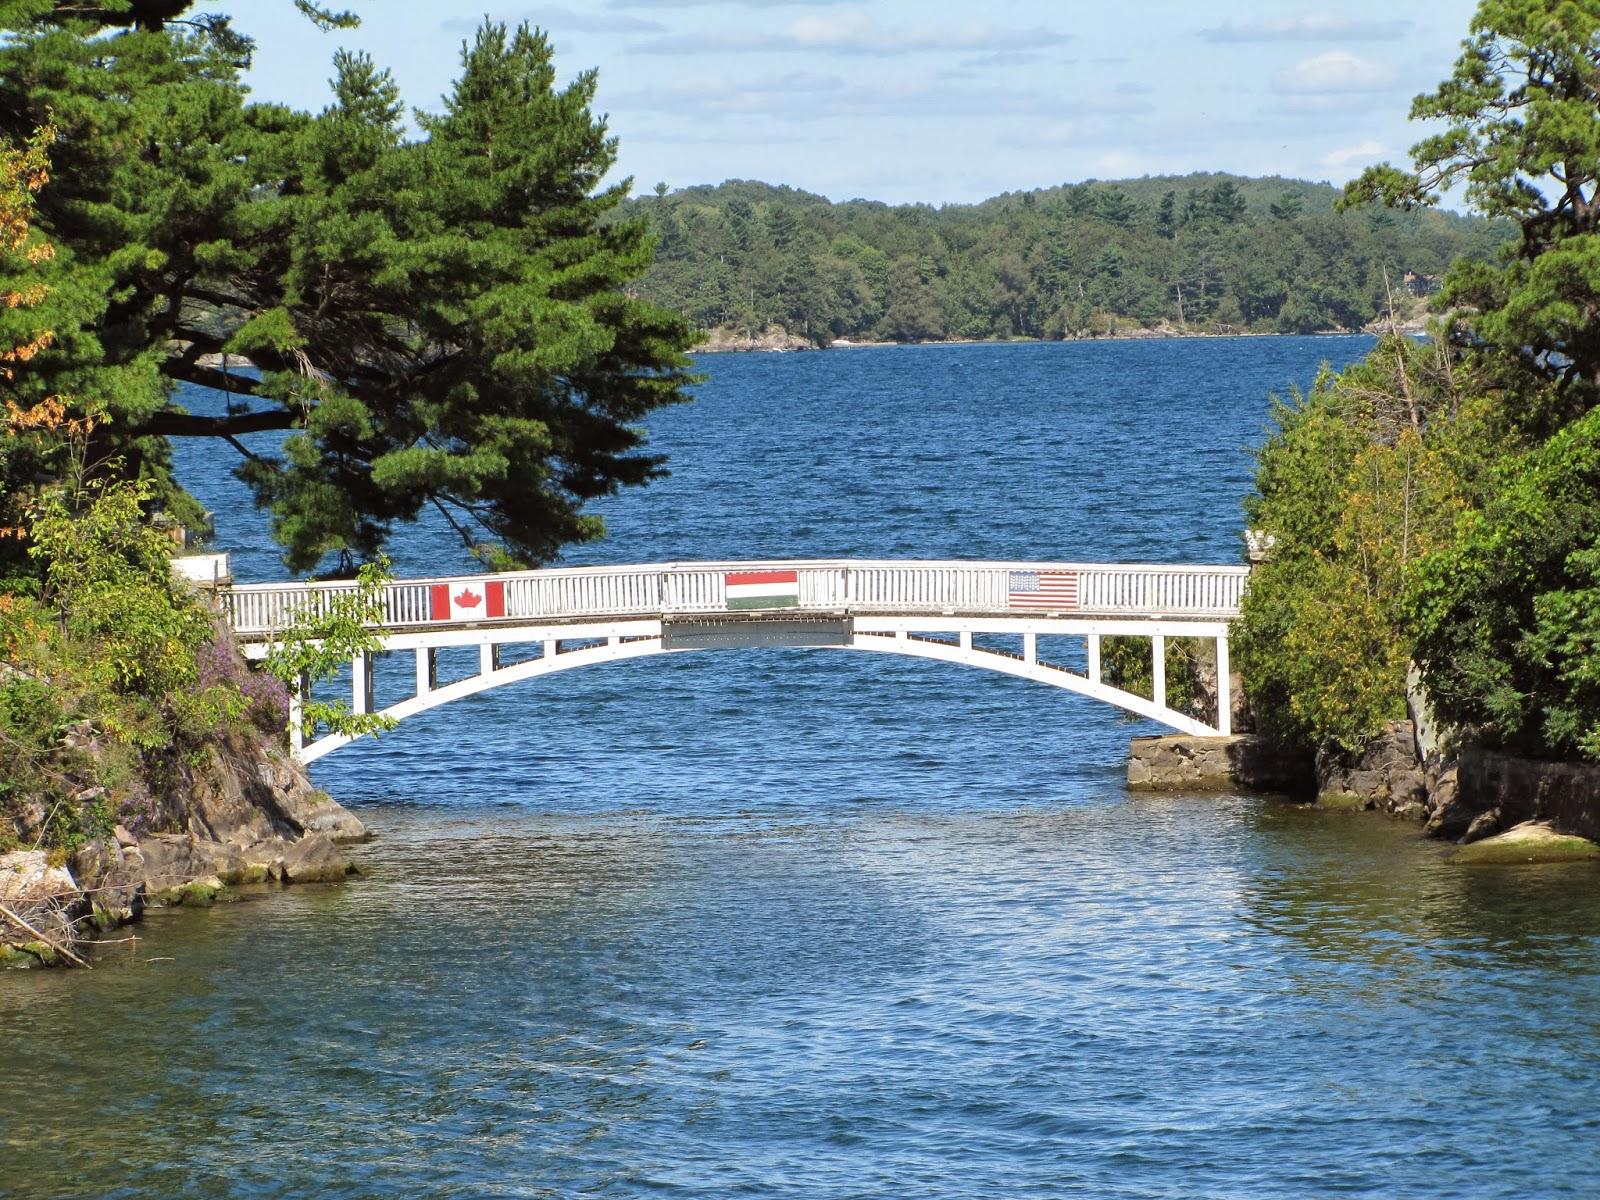 Cat Island In Japan World S Most Shortest International Bridge For Fum And